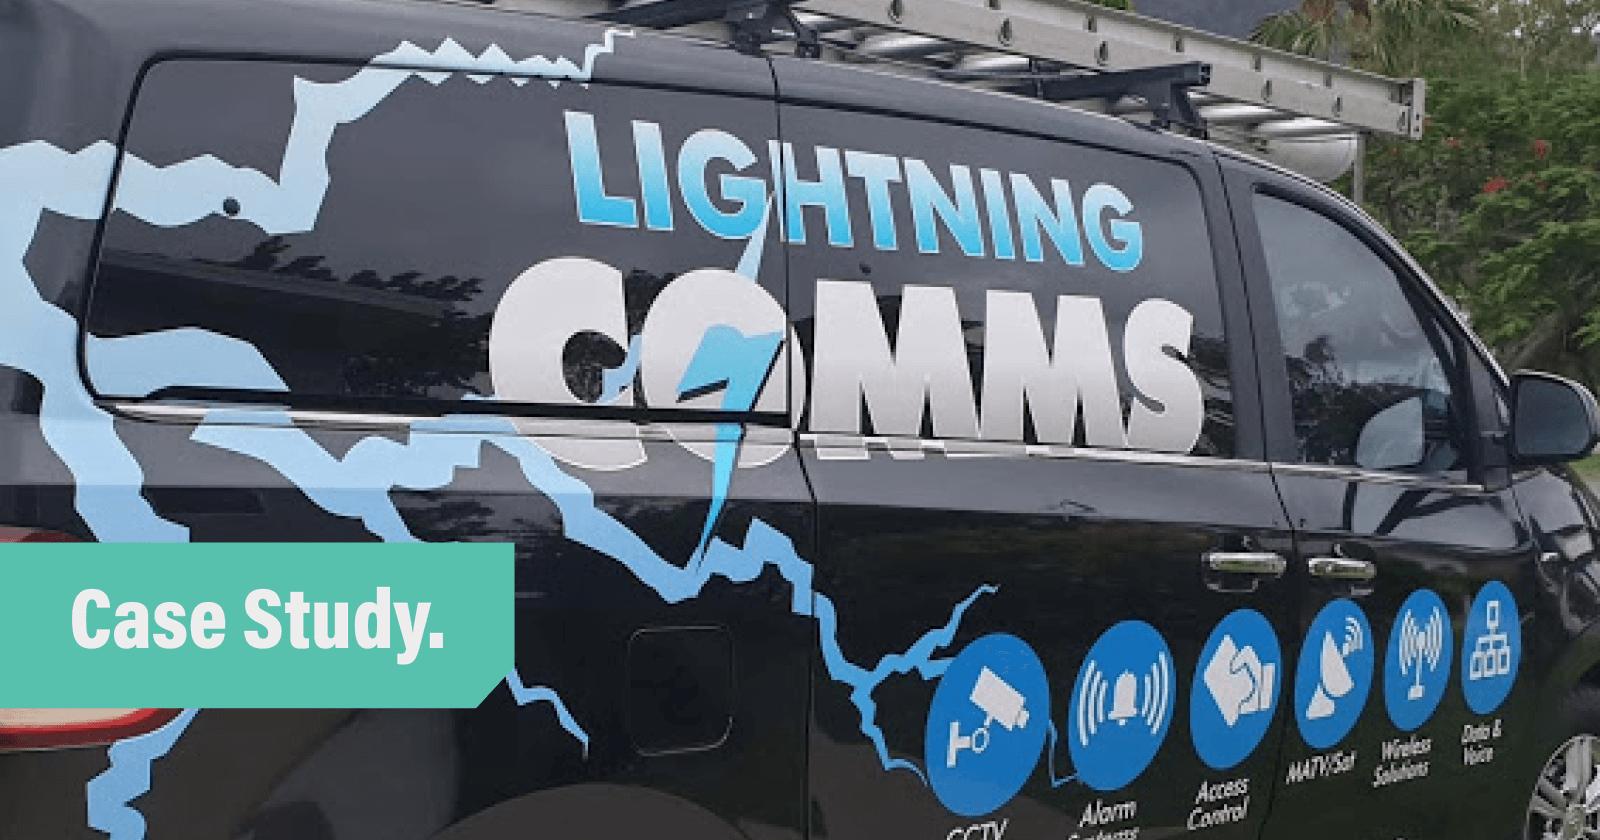 Casestudy_Lightning_Comms_cover-1